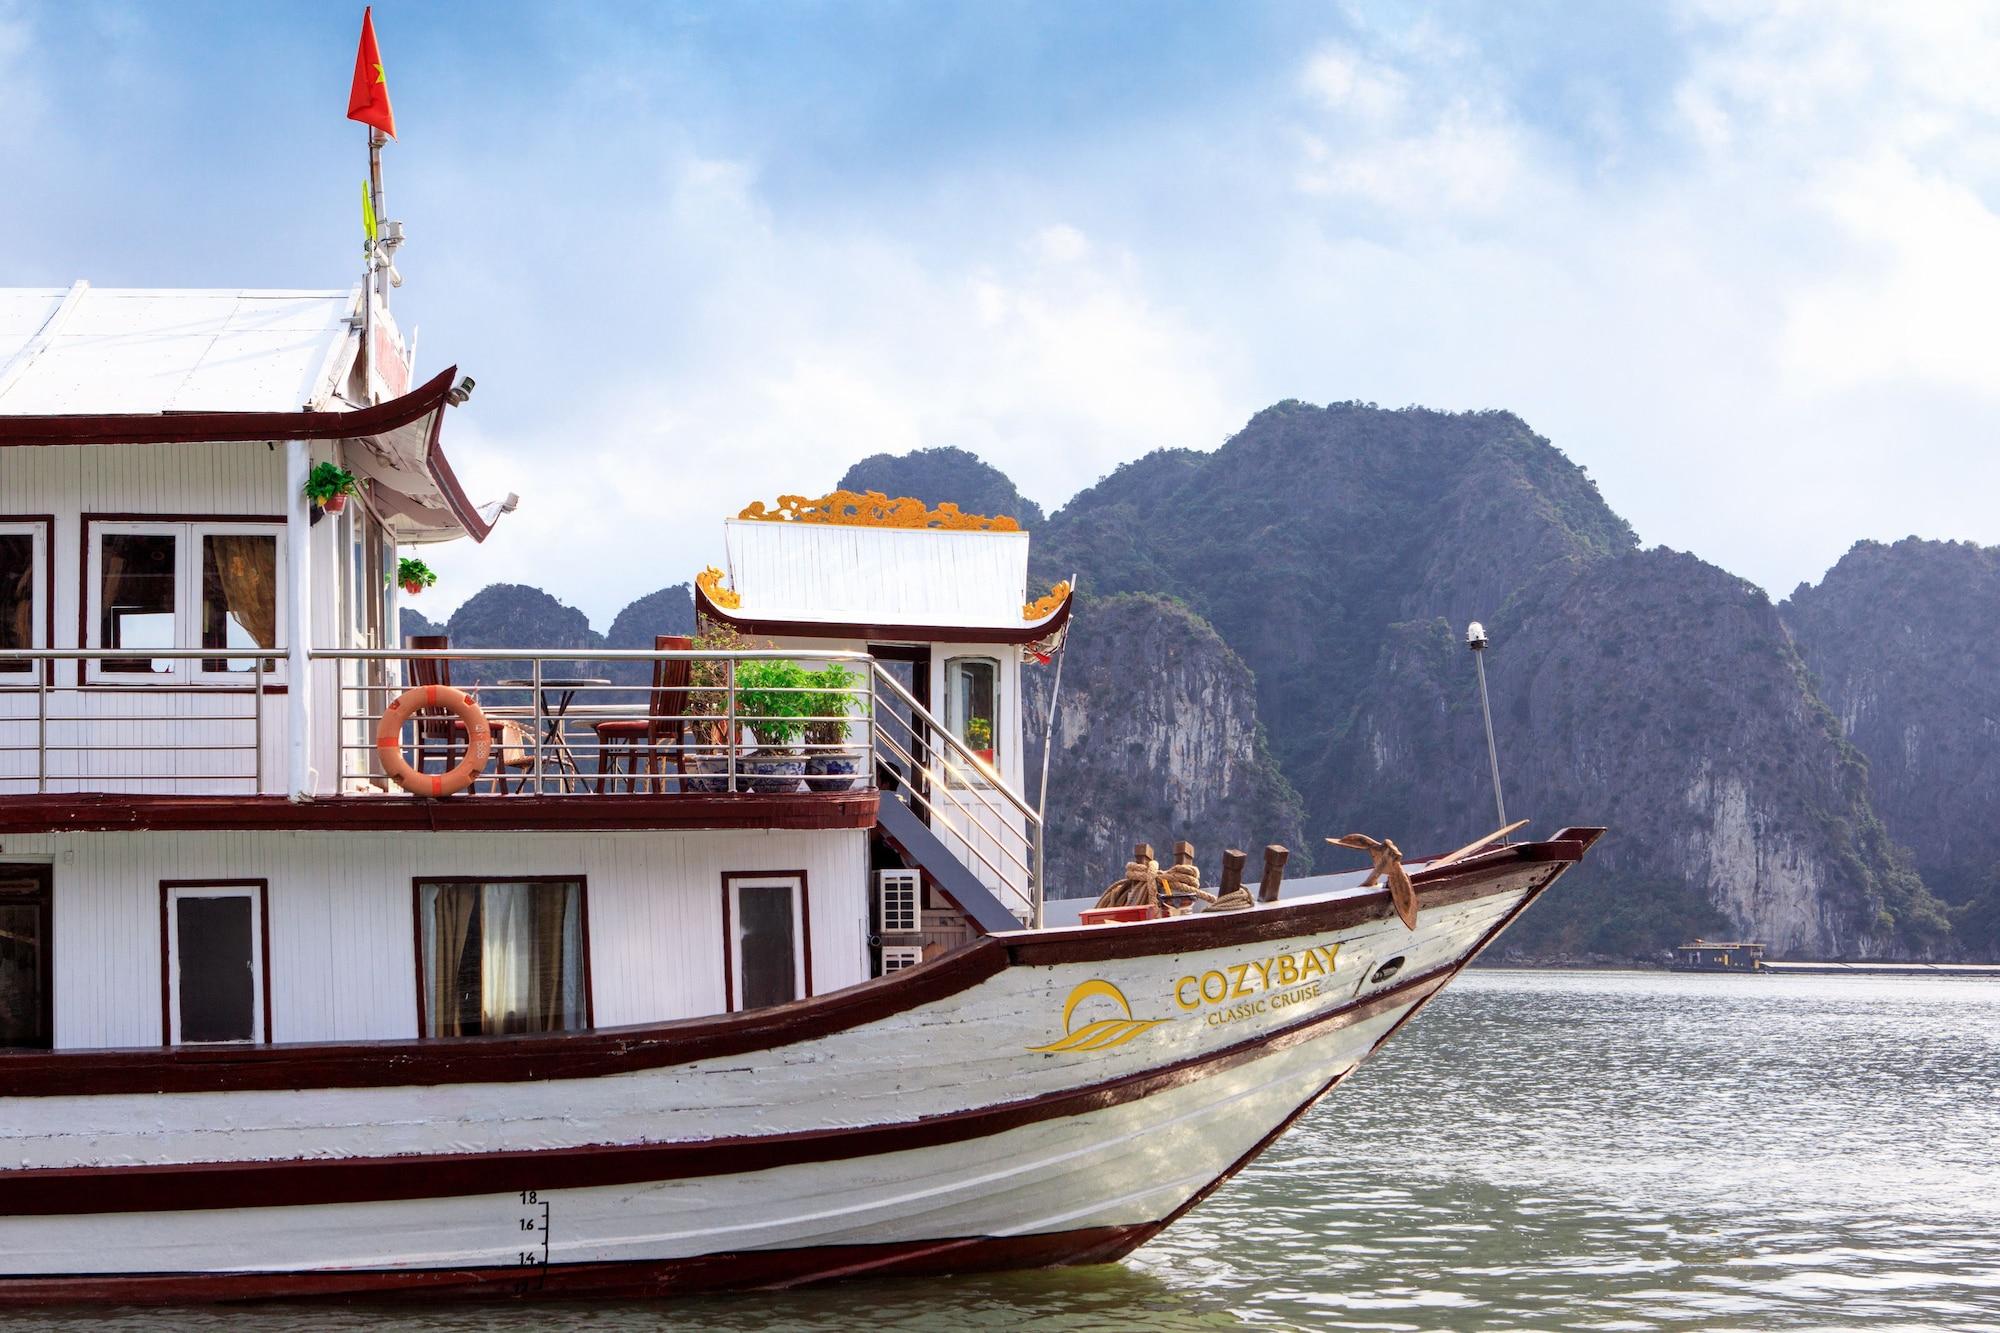 Cozy Bay Classic Cruise, Hạ Long